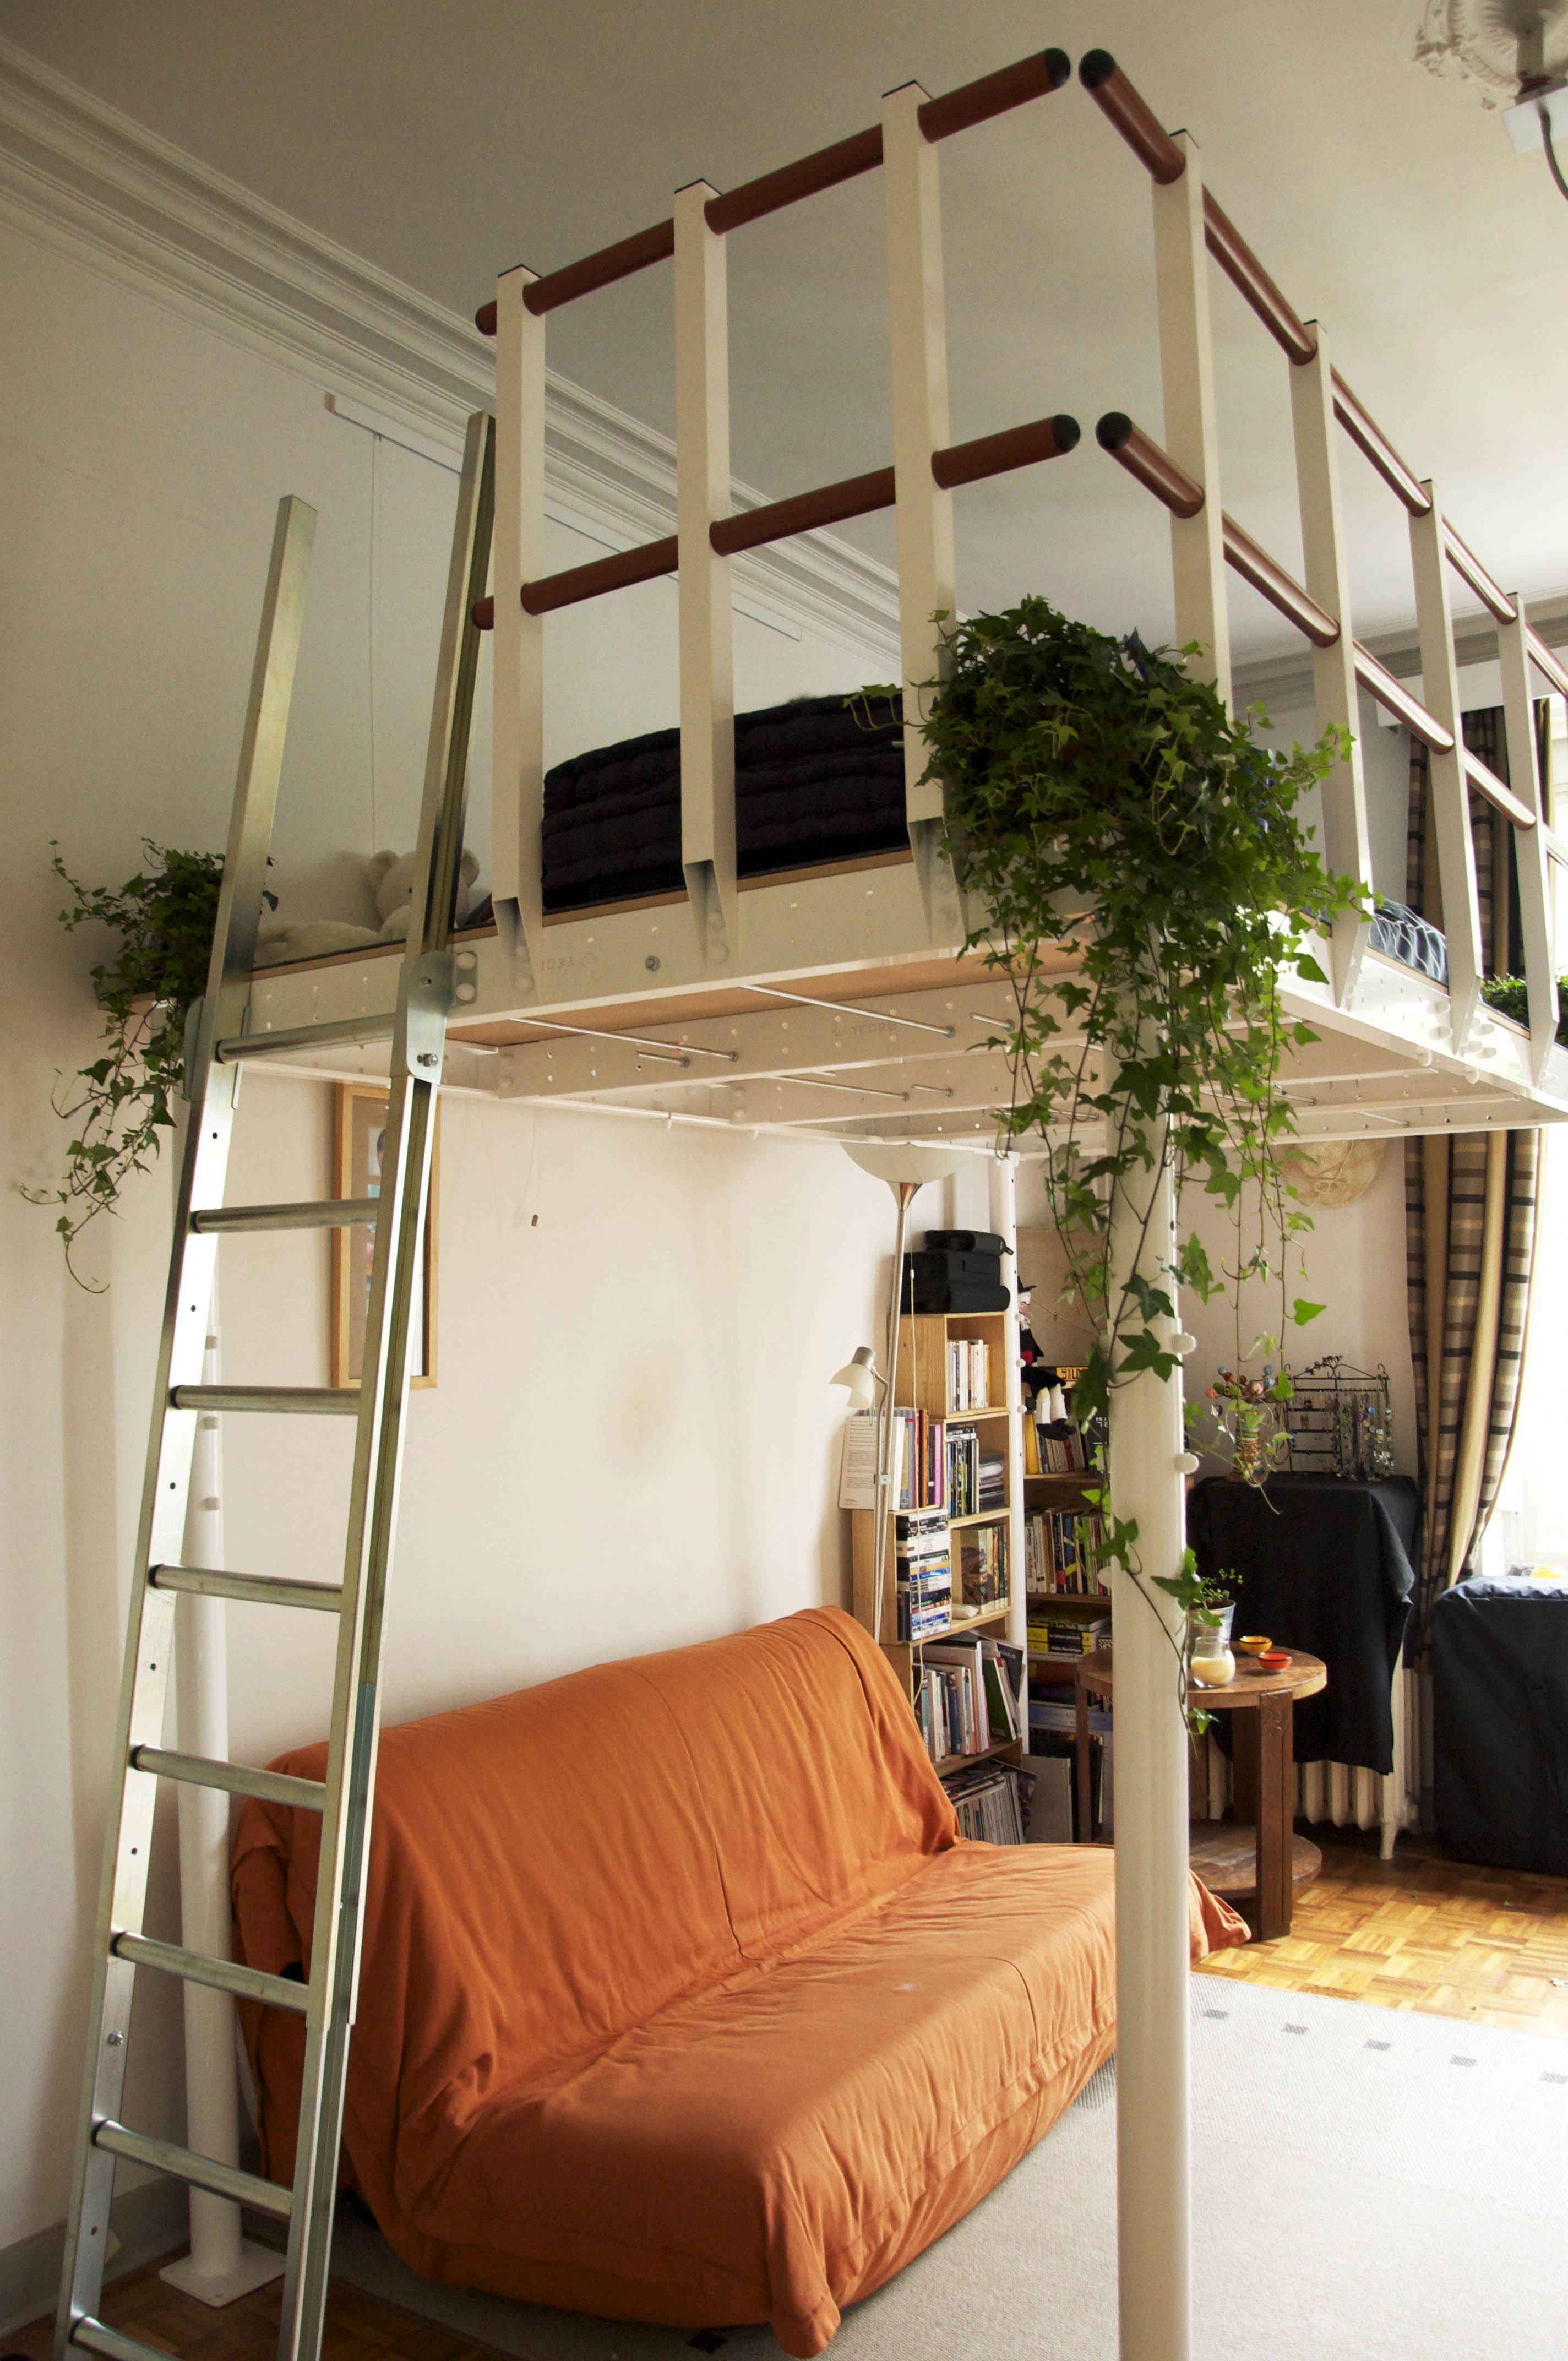 Vancouver DIY Loft T8 Kit | Lofts, Mezzanine and Mezzanine loft